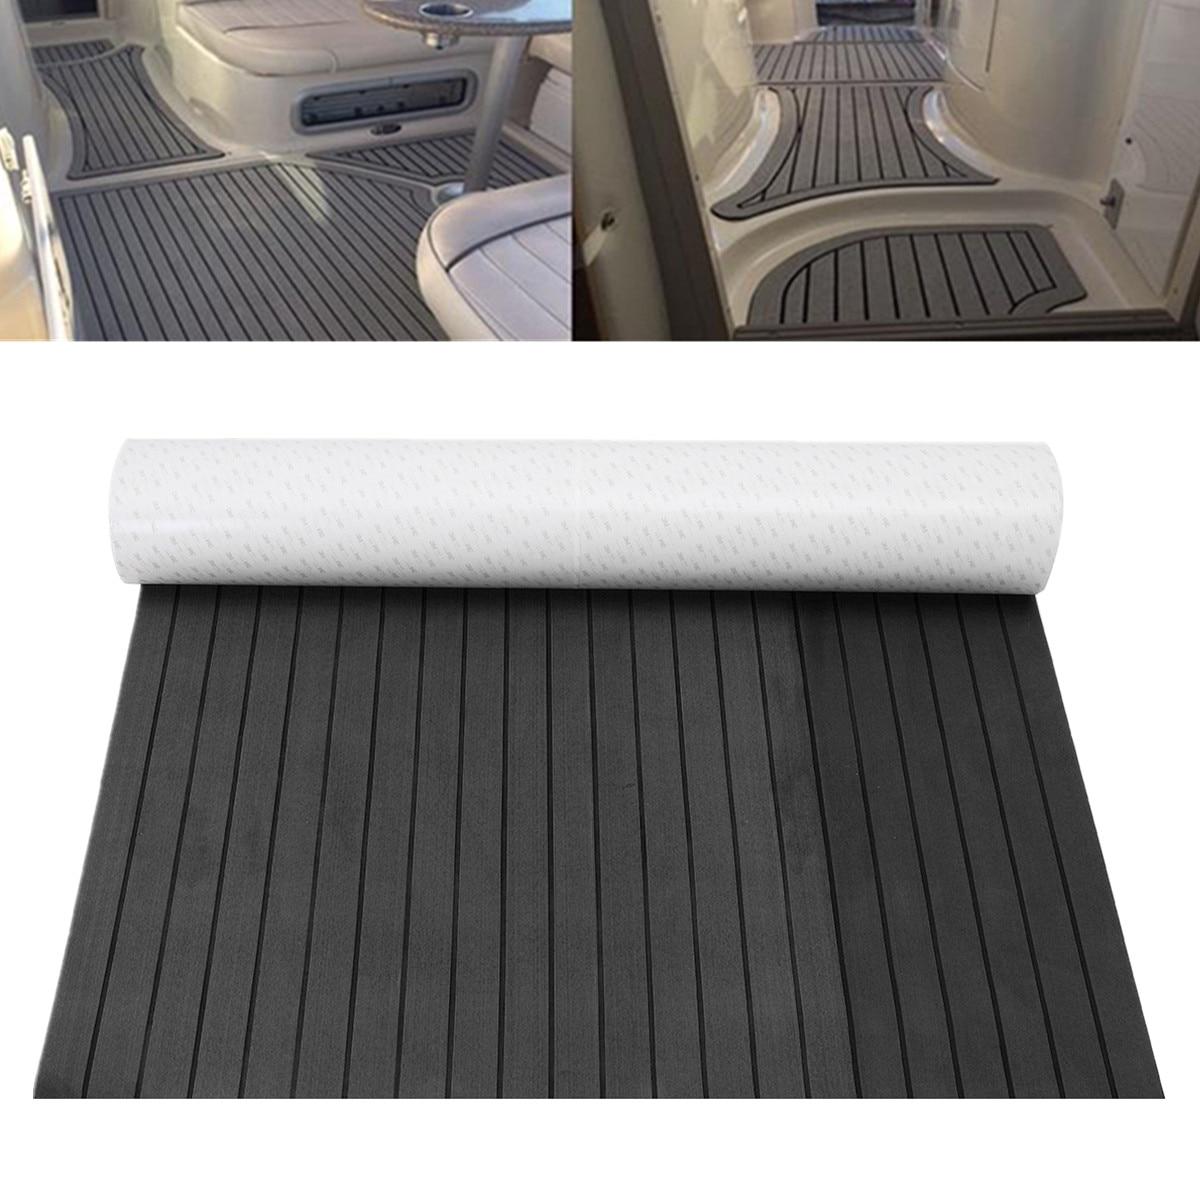 1200mmx2400mmx5mm Self-Adhesive Foam Teak Decking EVA Foam Marine Flooring Faux Boat Decking Sheet Accessories Marine Dark Grey